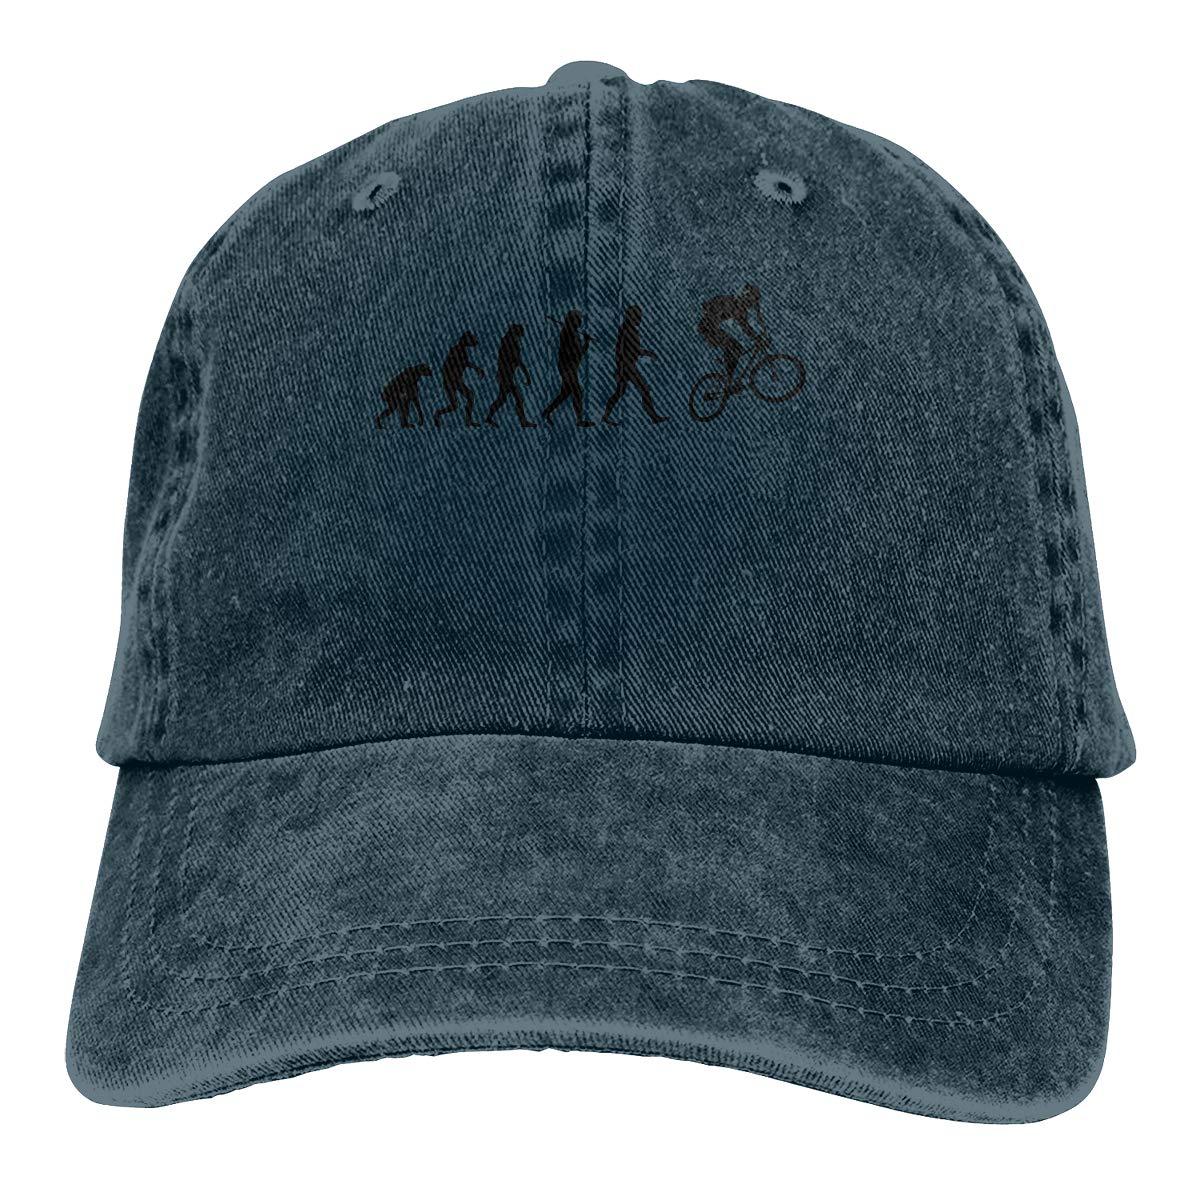 Qbeir Adult Unisex Cowboy Cap Adjustable Hat Motocross Evolution Cotton Denim